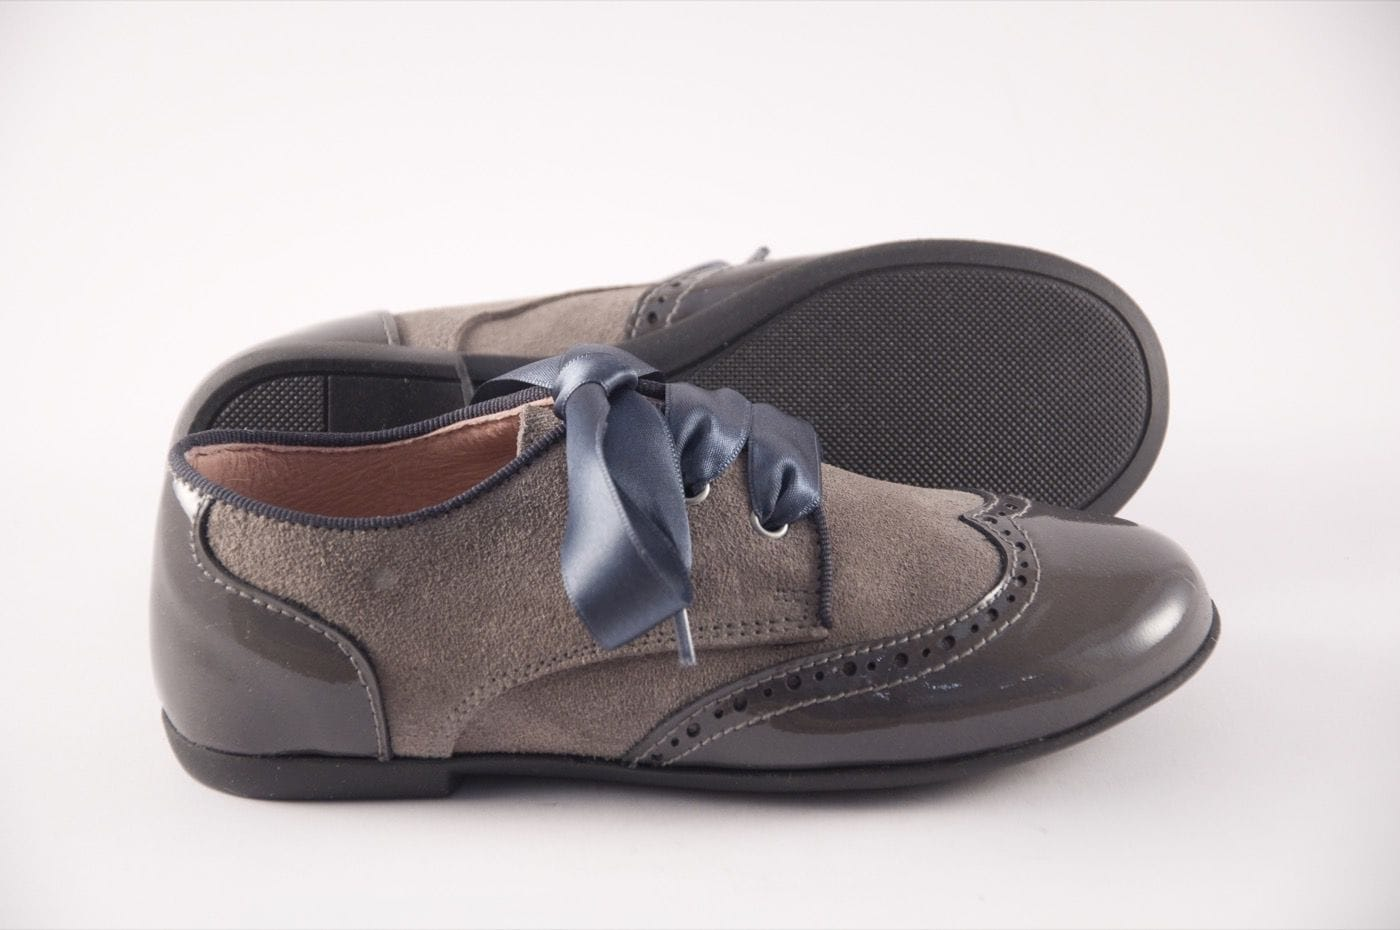 d5de566370b Blucher Zapato Color Charol Niña Tipo Estilo Gris Joven Comprar wzgdXUqX